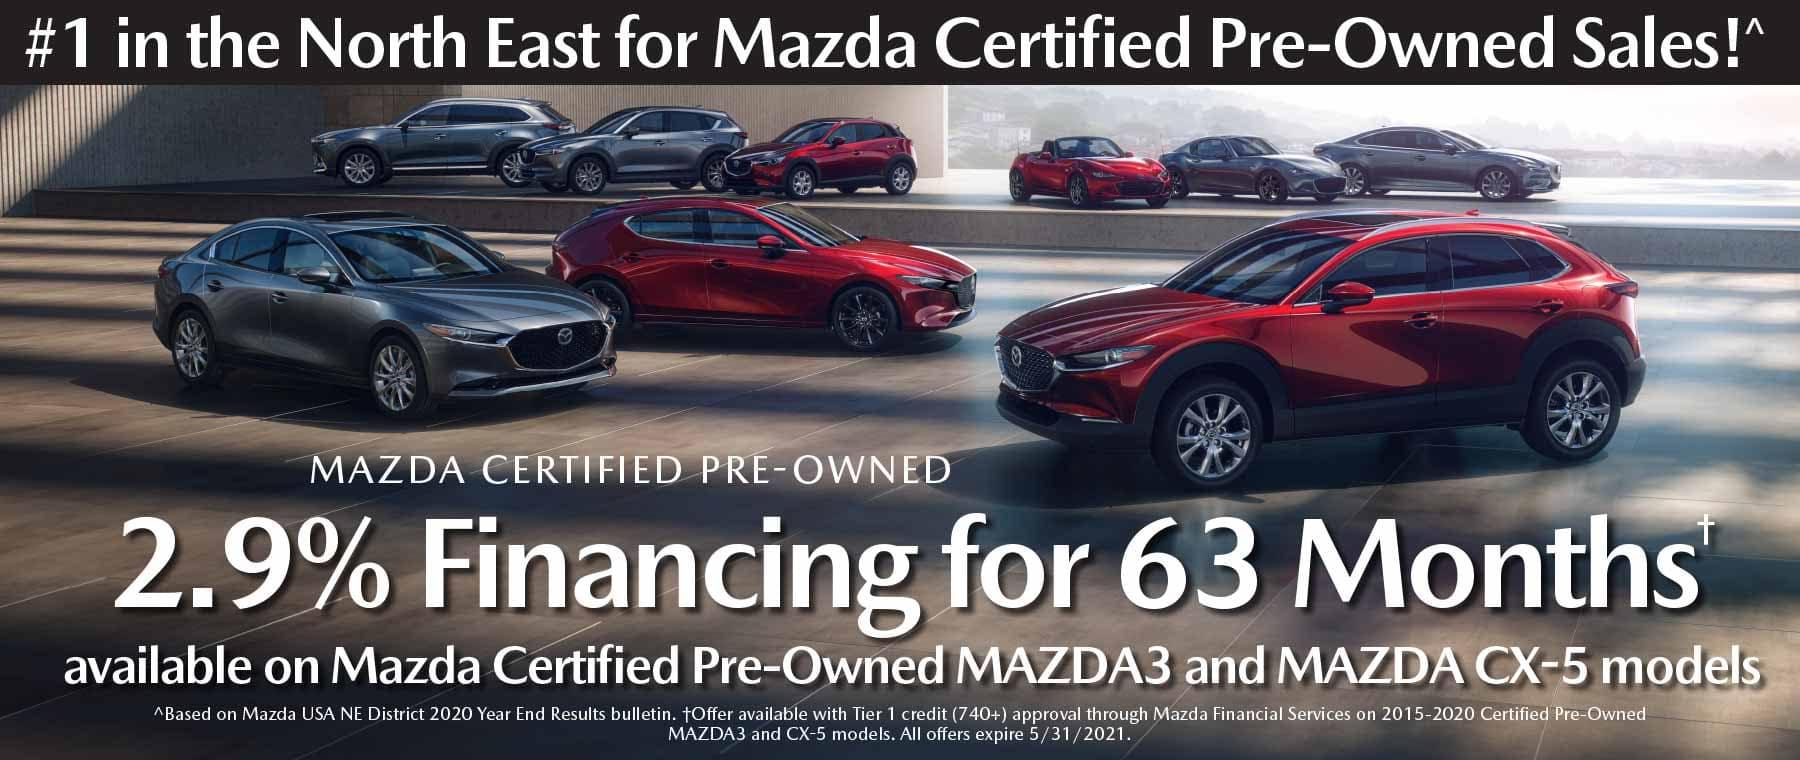 05hi CPO APR Mazda New Rochelle NY